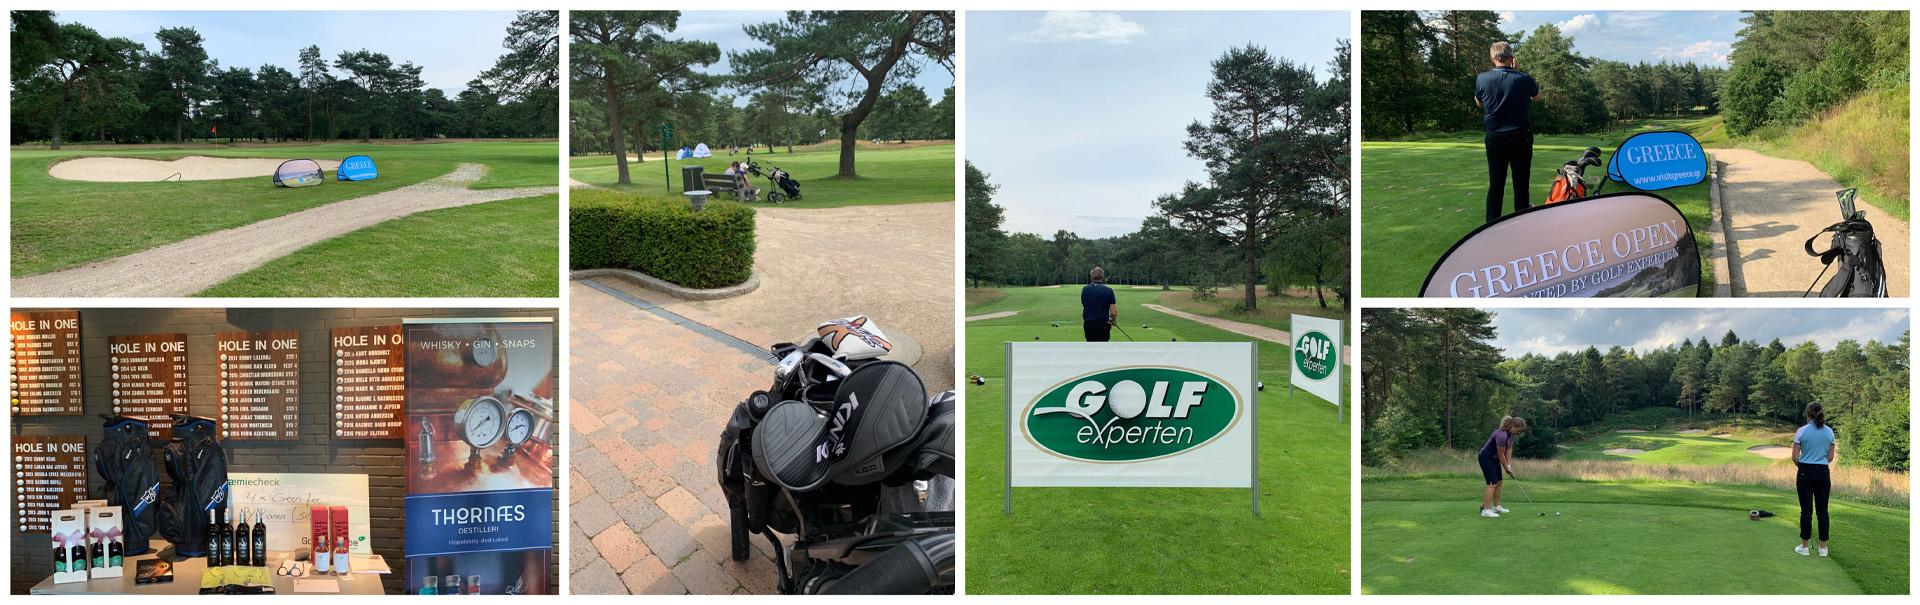 Greece Open - Presented by Golf Experten (Silkeborg)